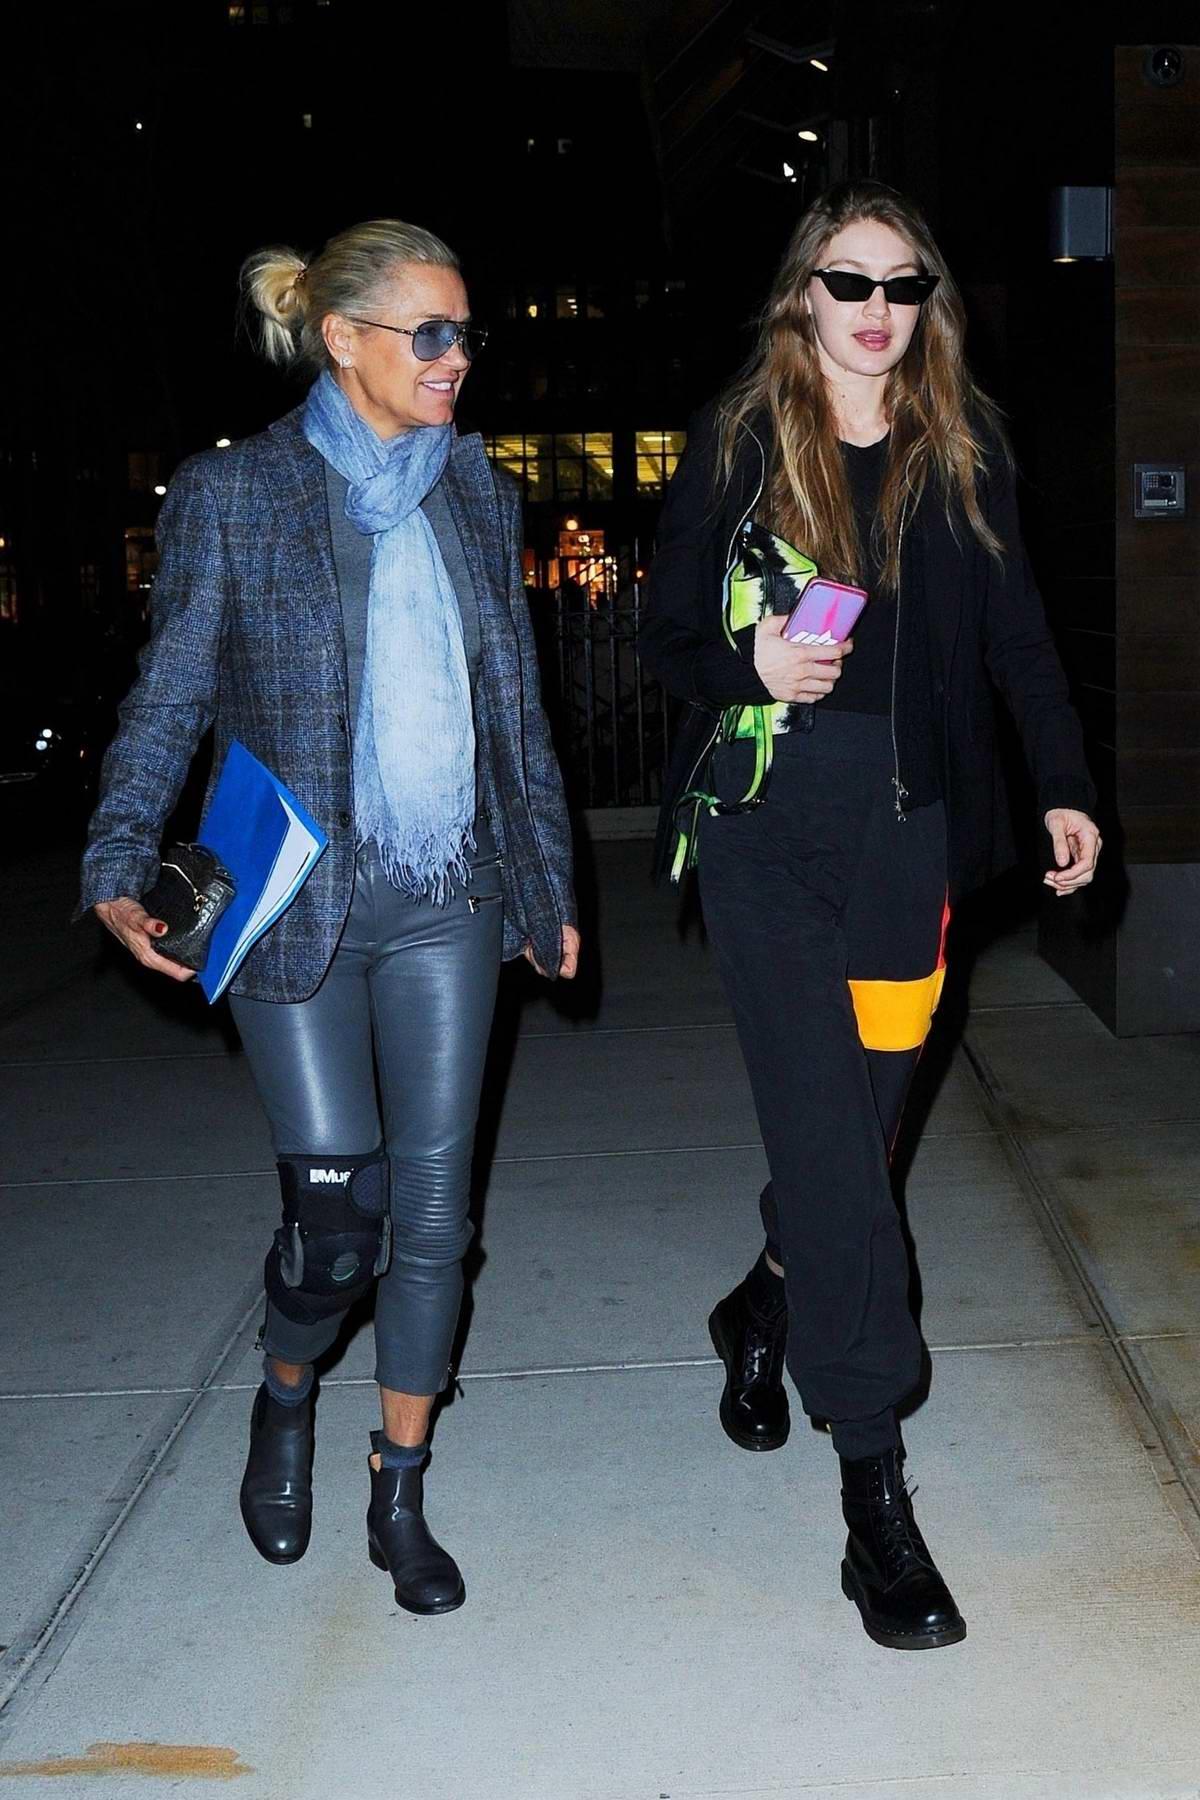 Gigi Hadid and Yolanda Hadid grab dinner at the Bondst restaurant in New York City